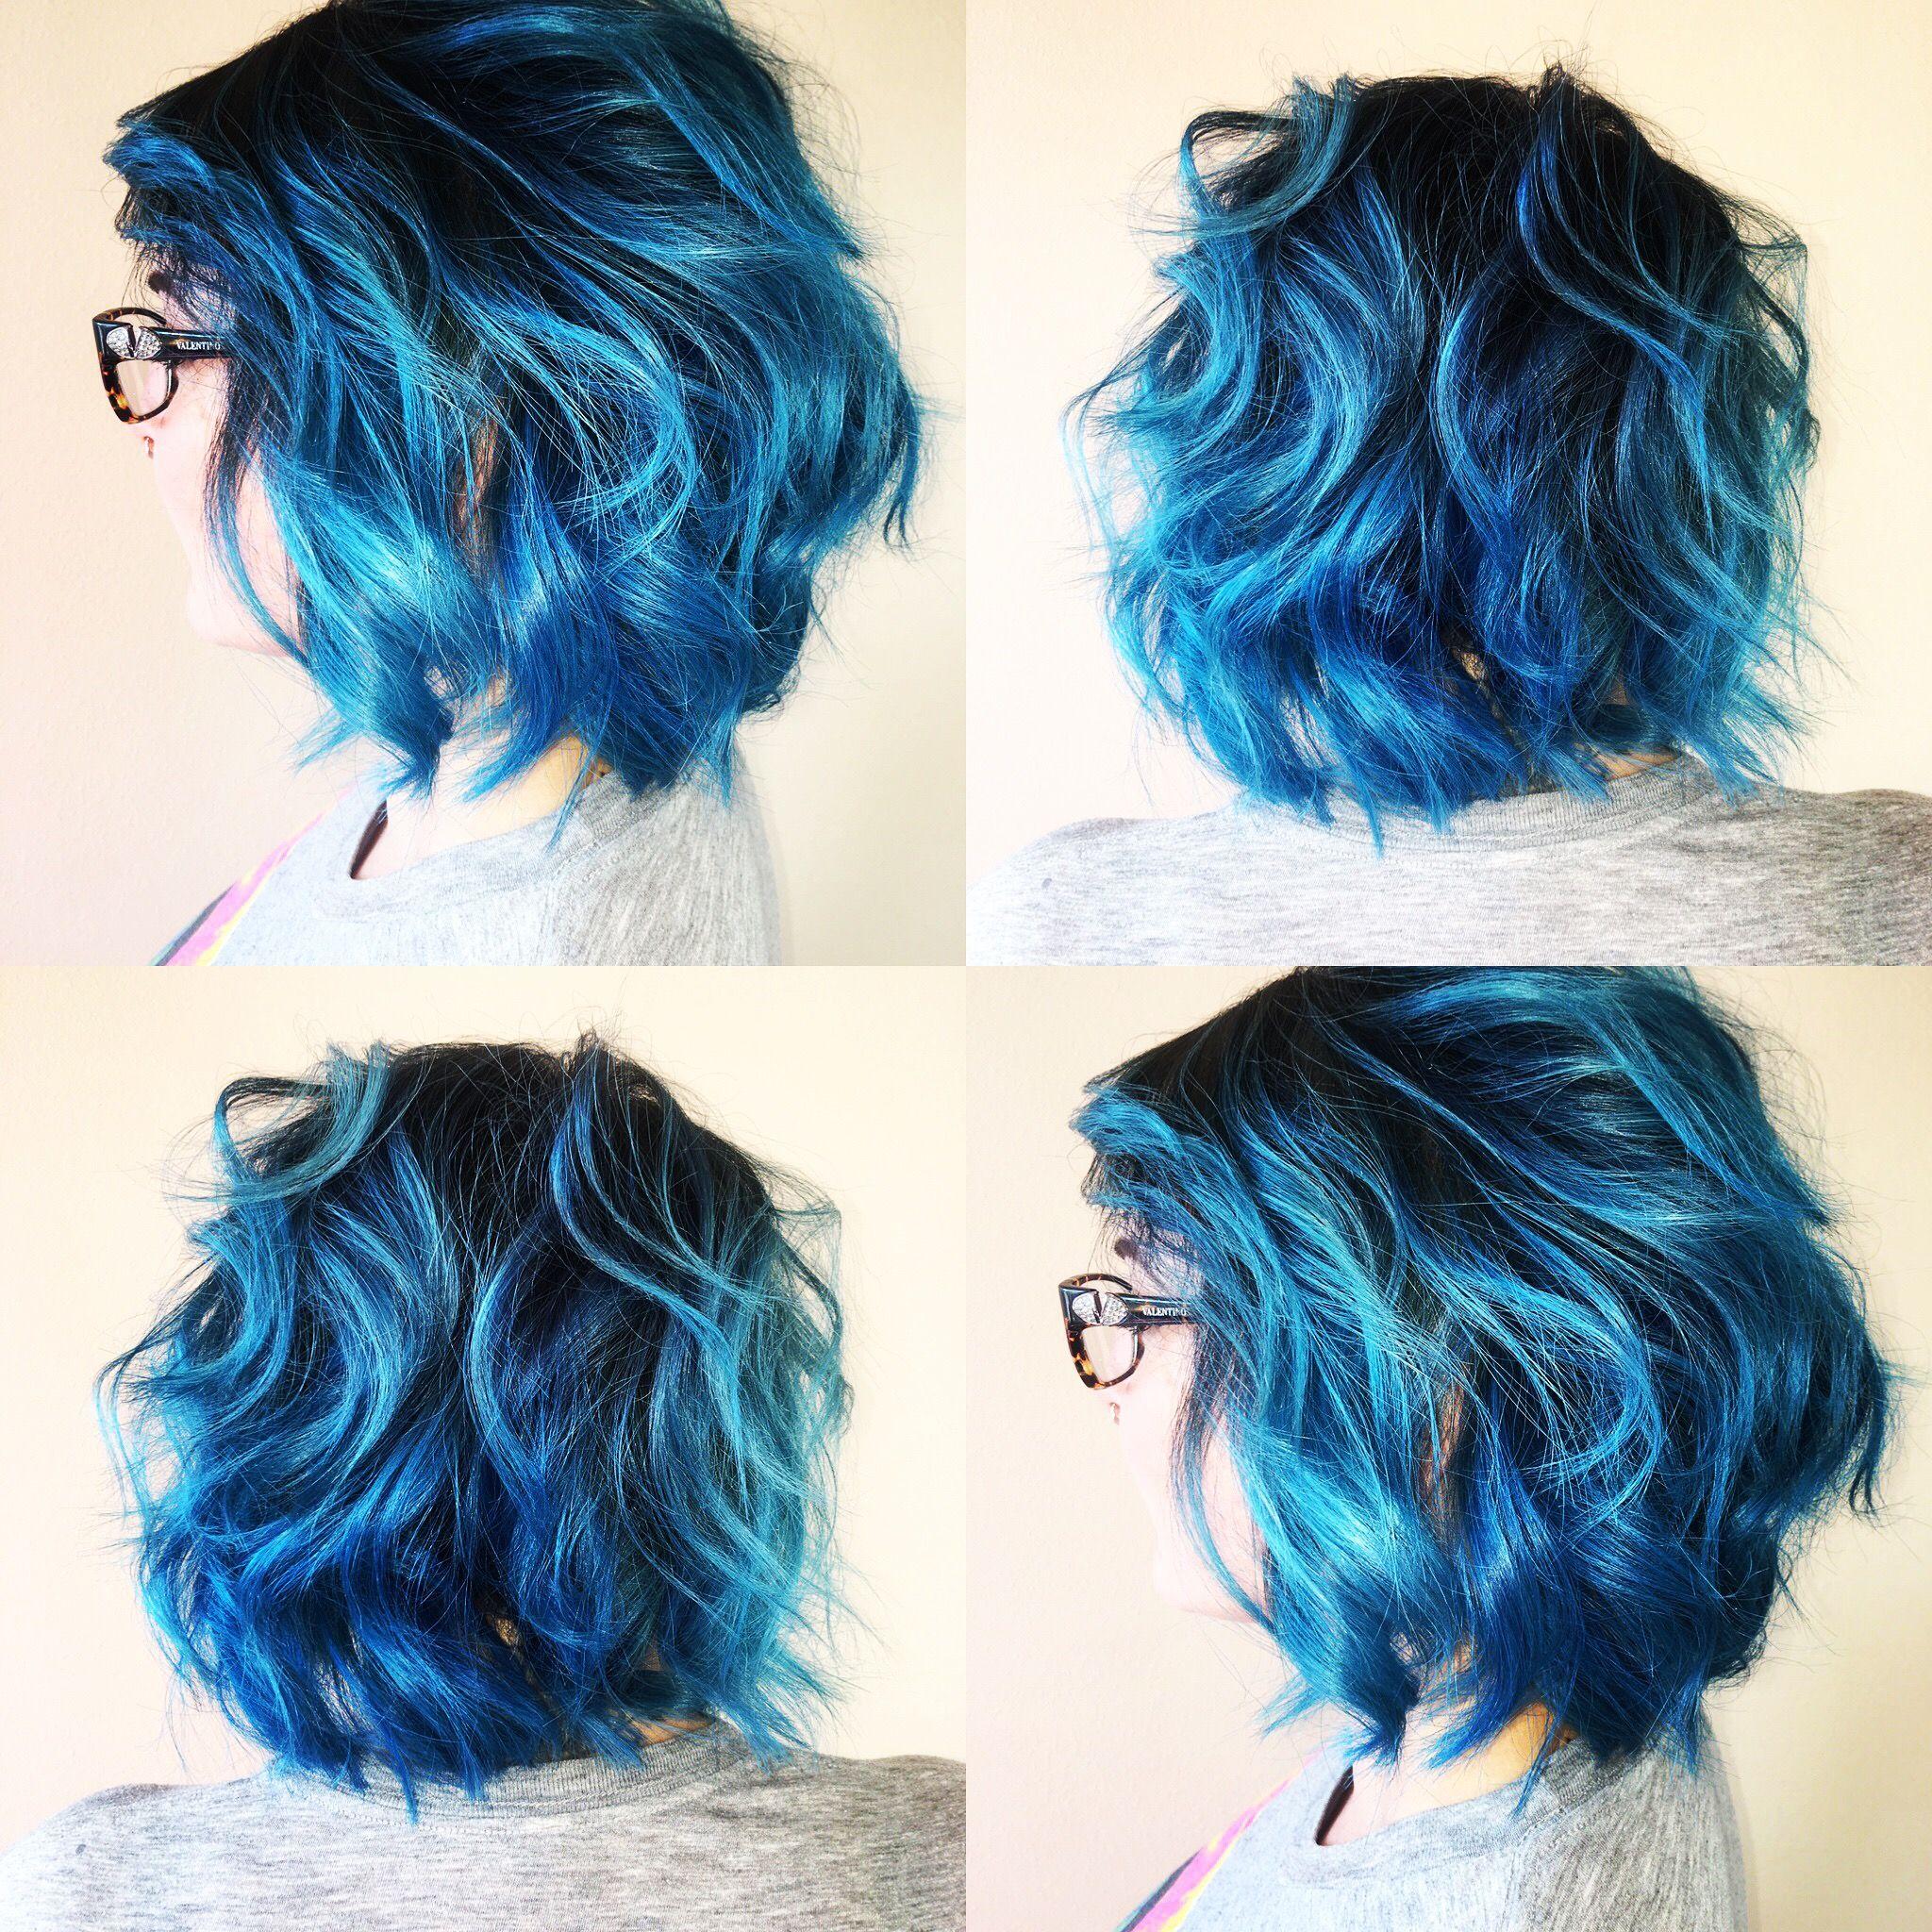 Halohairbysarah Shadowroot Bluehair Pravana Vivids Blonde Hair With Roots Dark Roots Blonde Hair Cool Hair Color